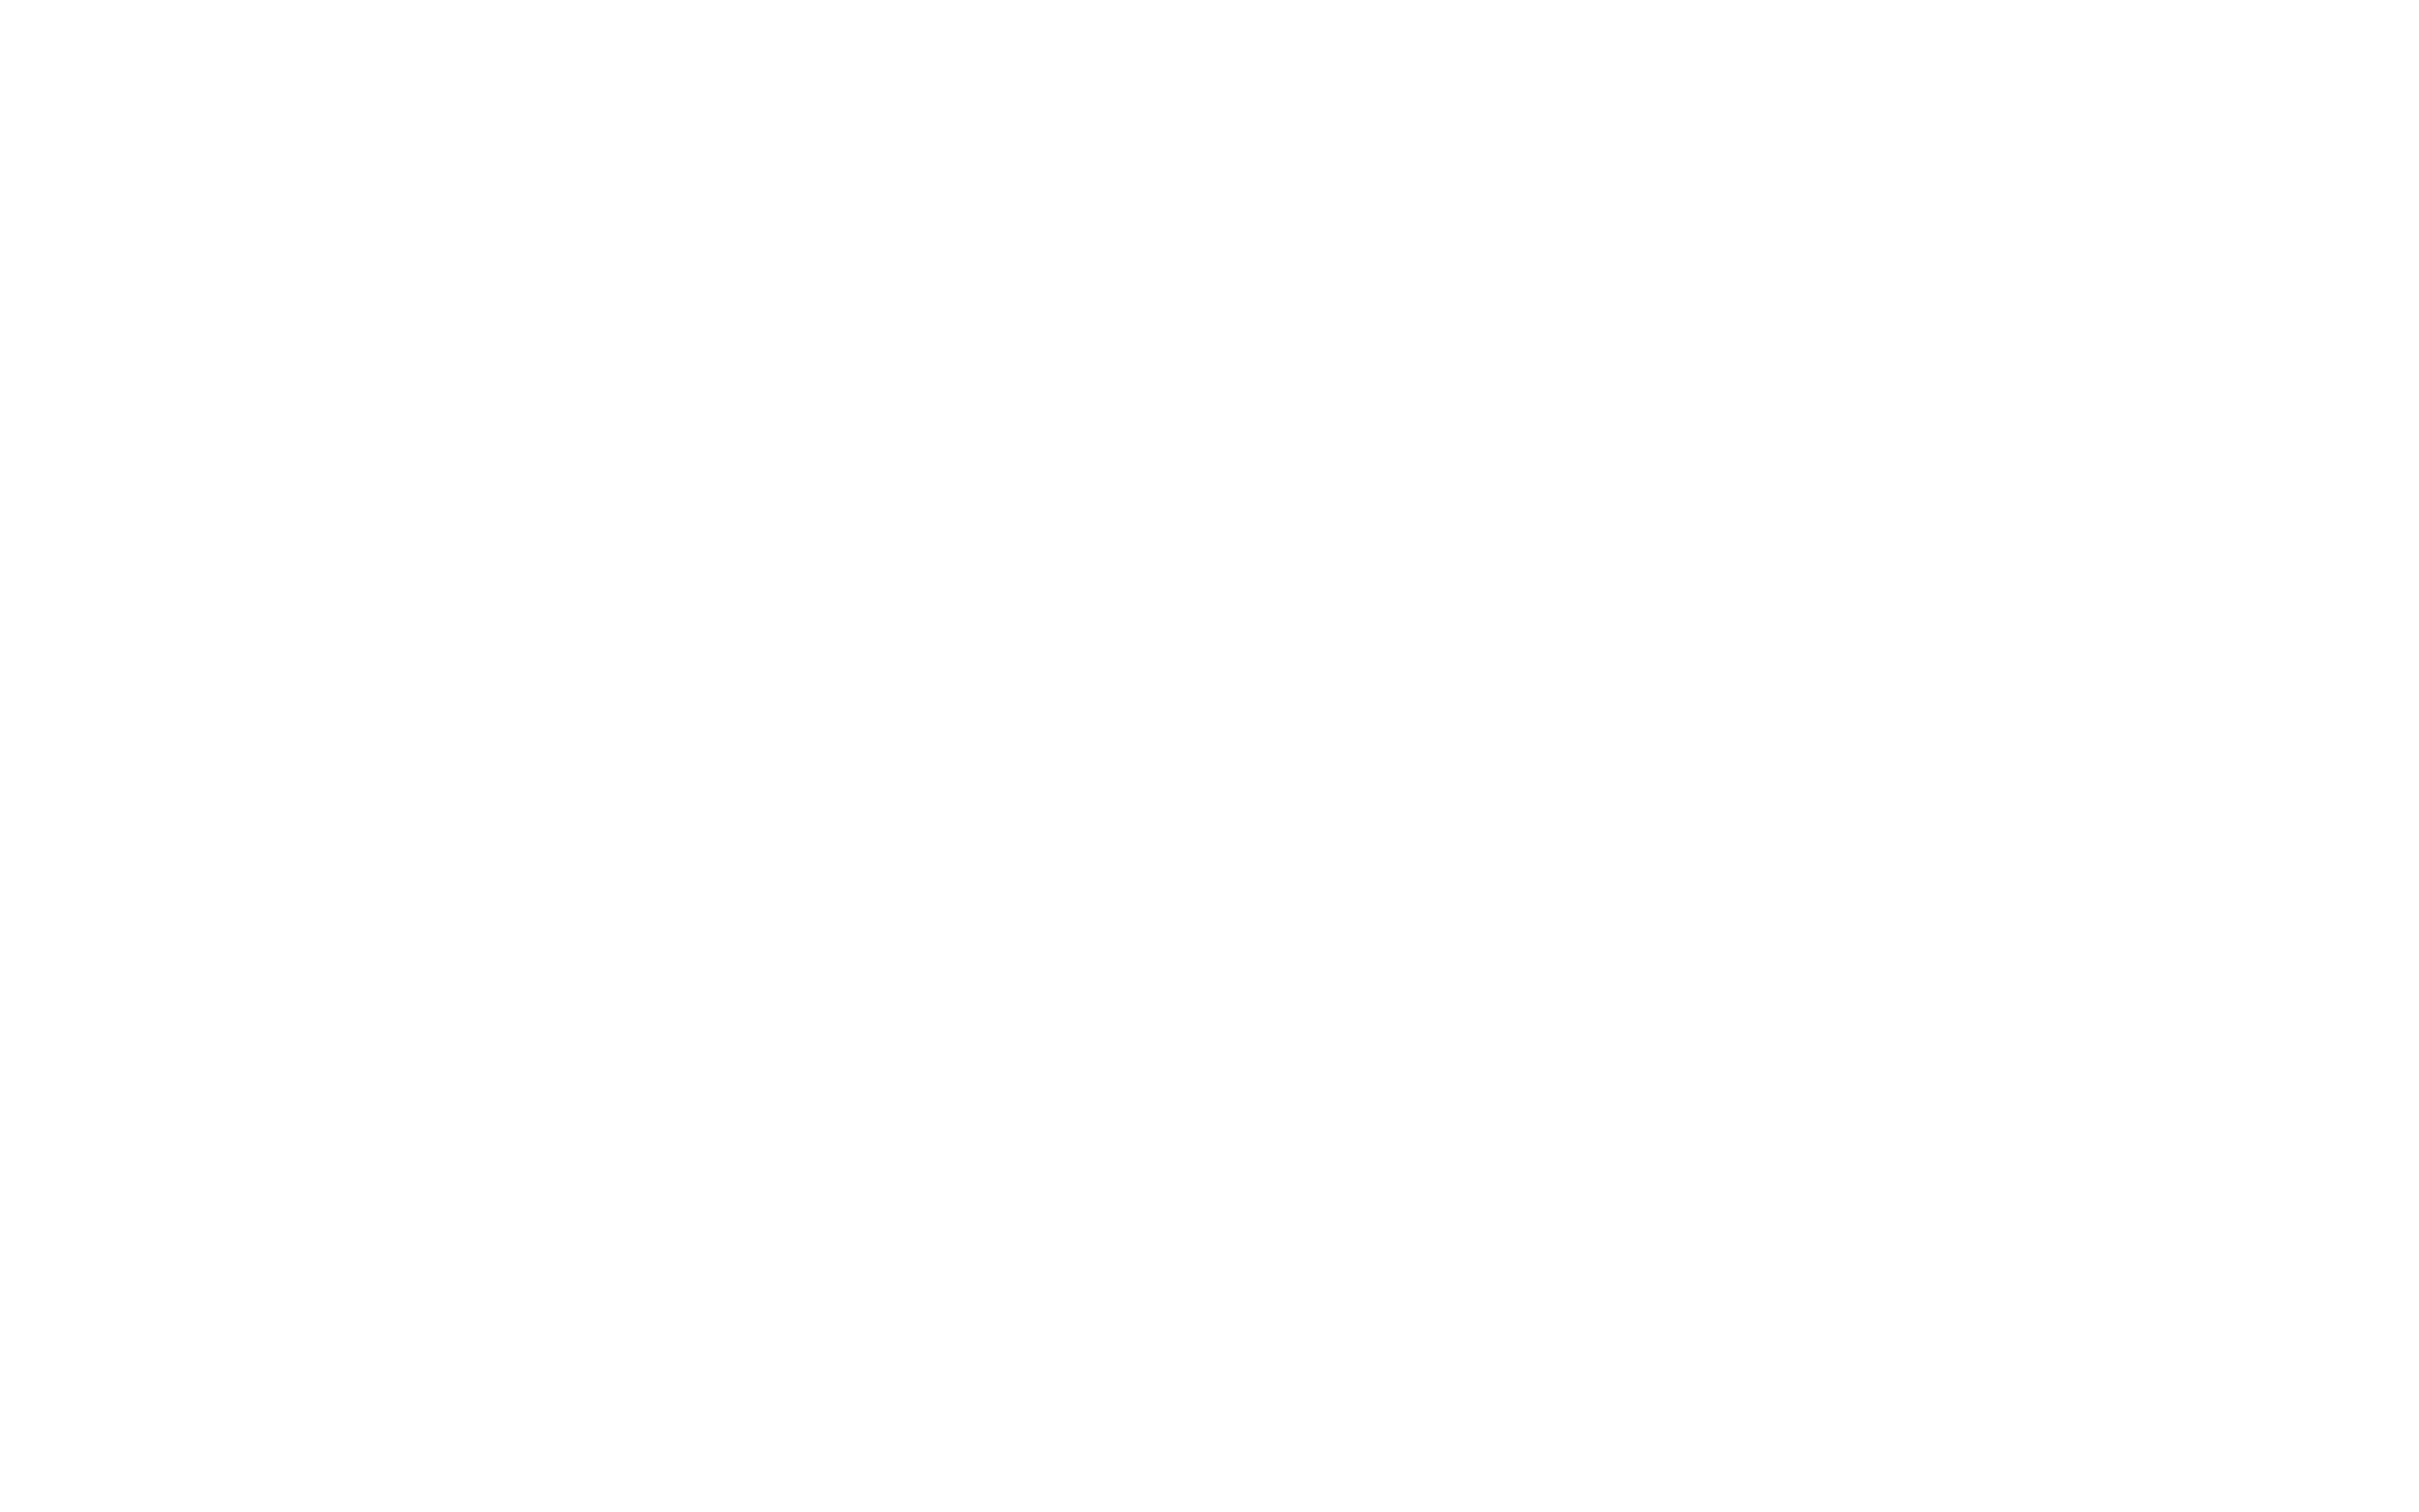 Class3 Digital Signature Services